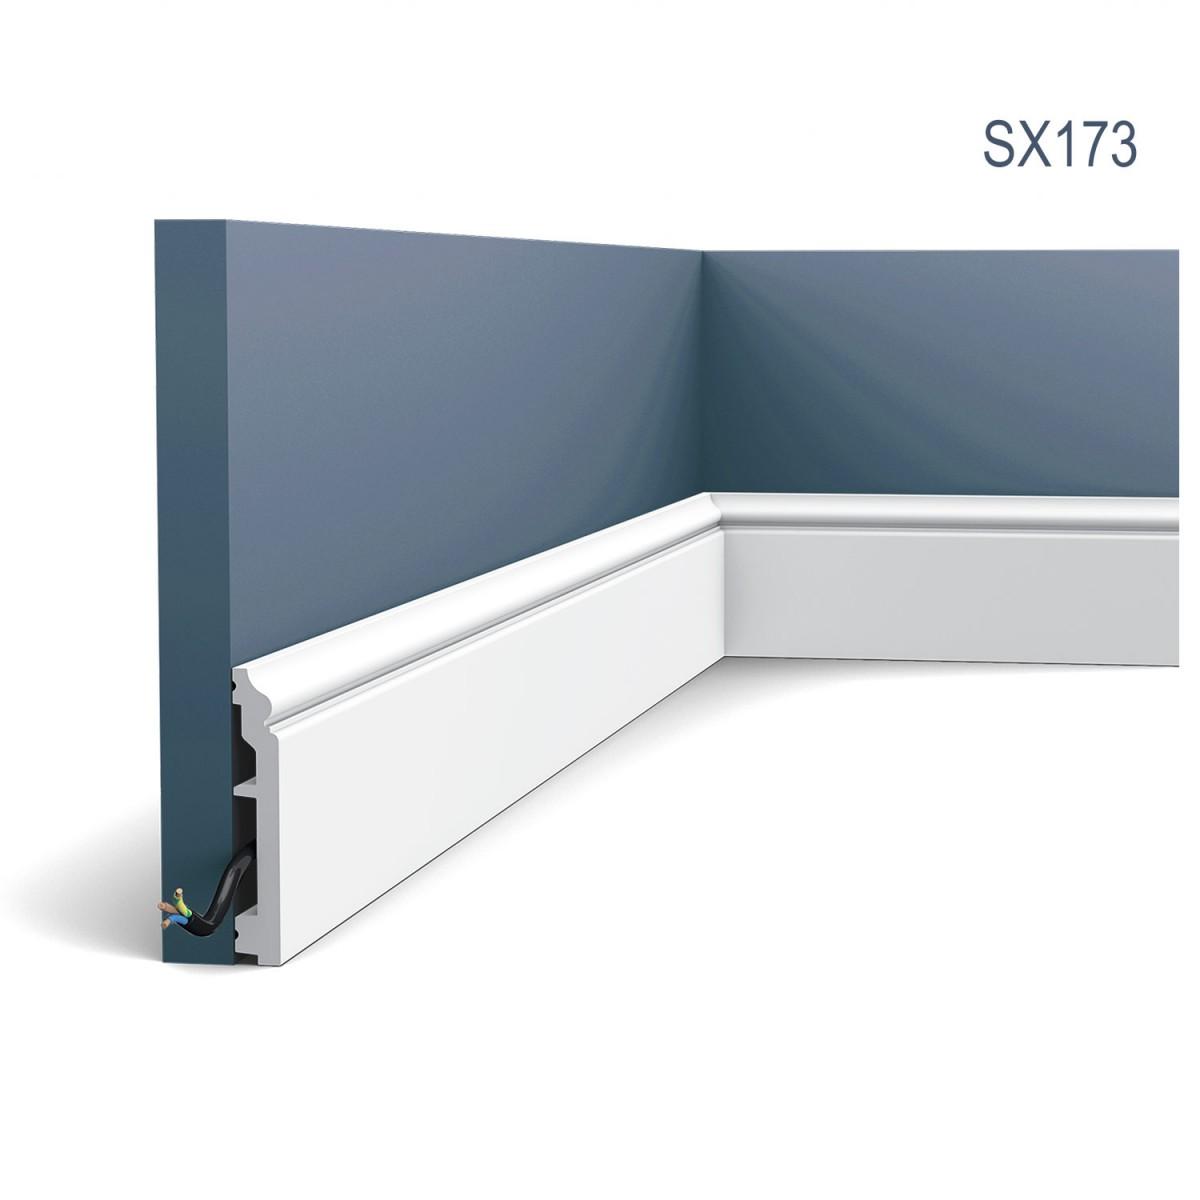 Plinta Axxent SX173, Dimensiuni: 200 X 1.6 X 10 cm, Orac Decor